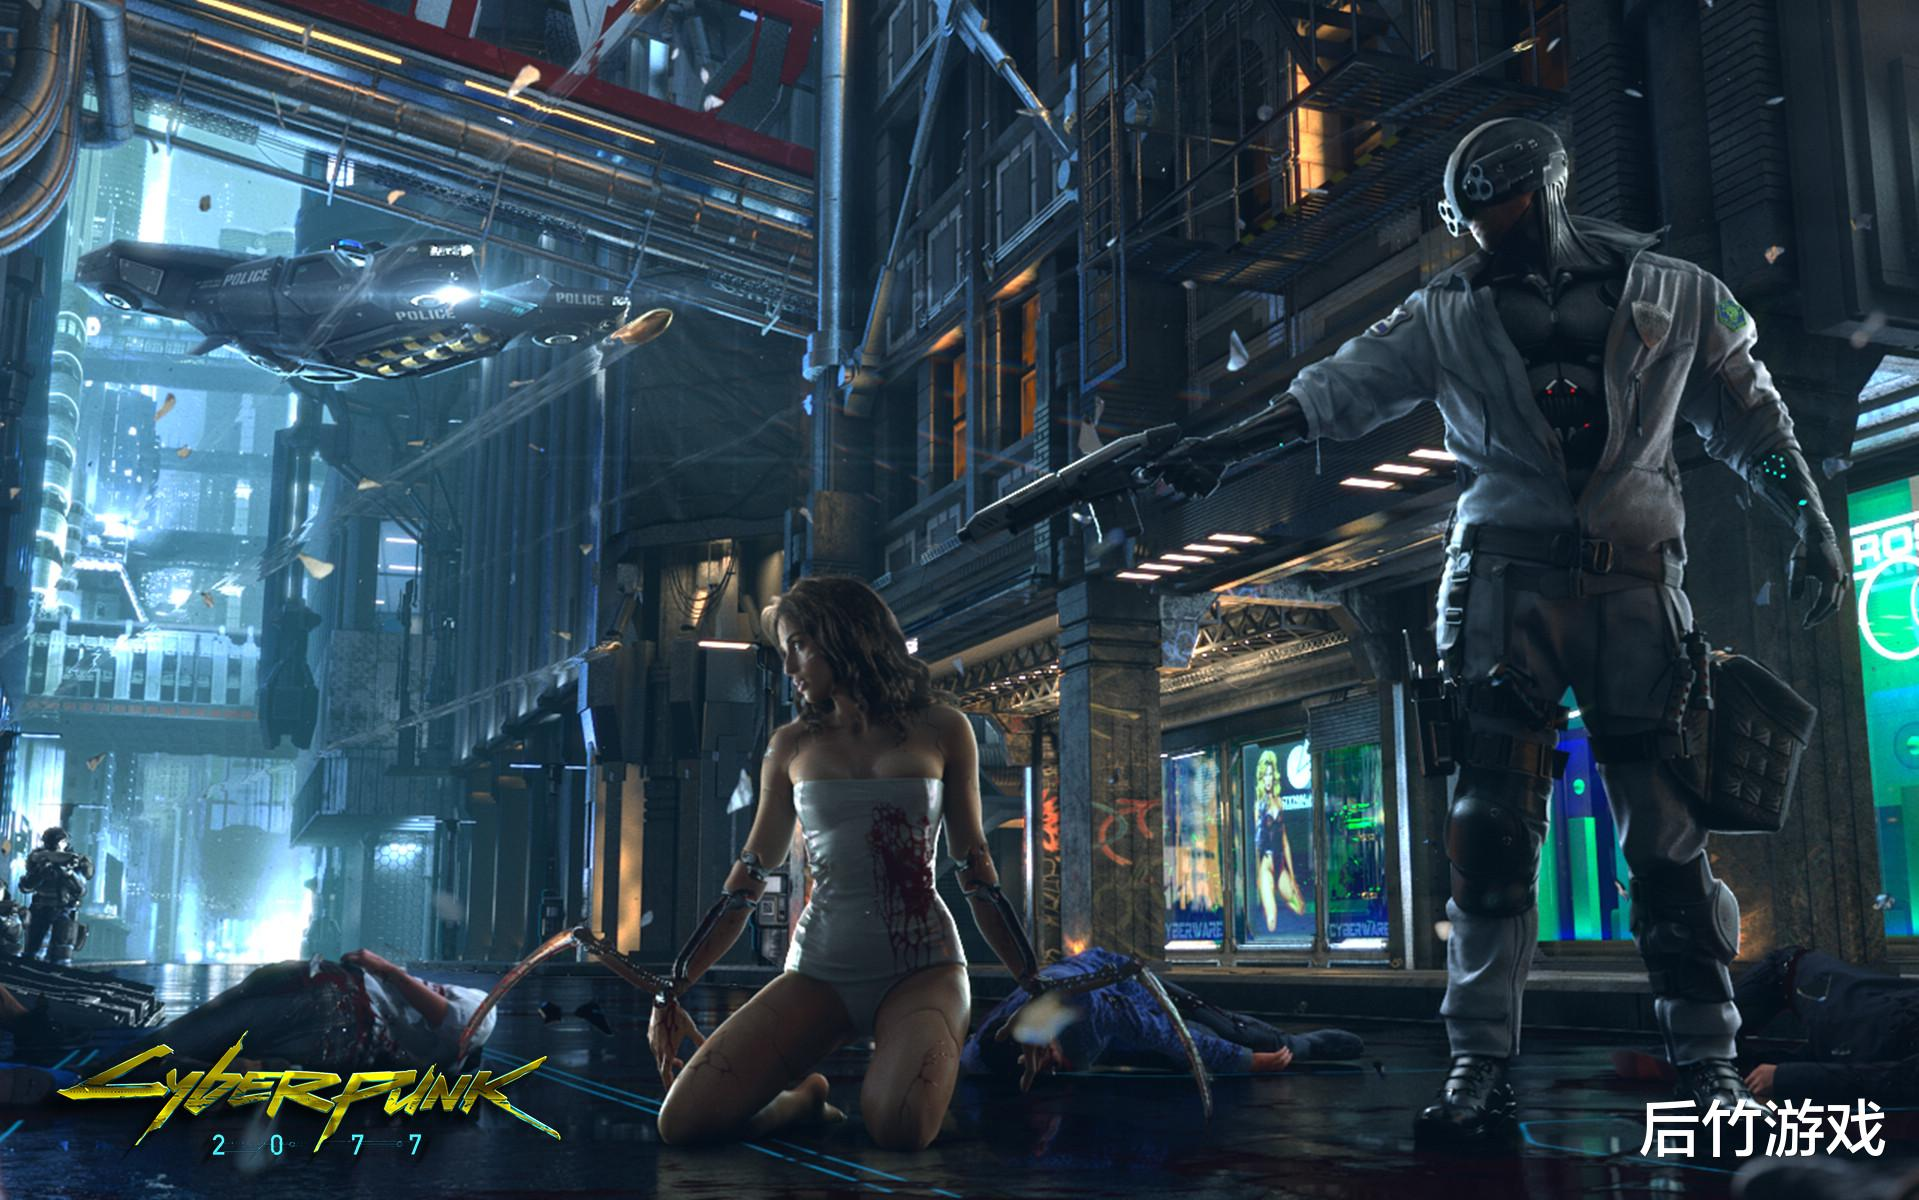 CD Projekt官方辟谣:《赛博朋克2077》不会加入微软Xbox会员服务 赛博朋克2077 xbox 手游热点  第3张